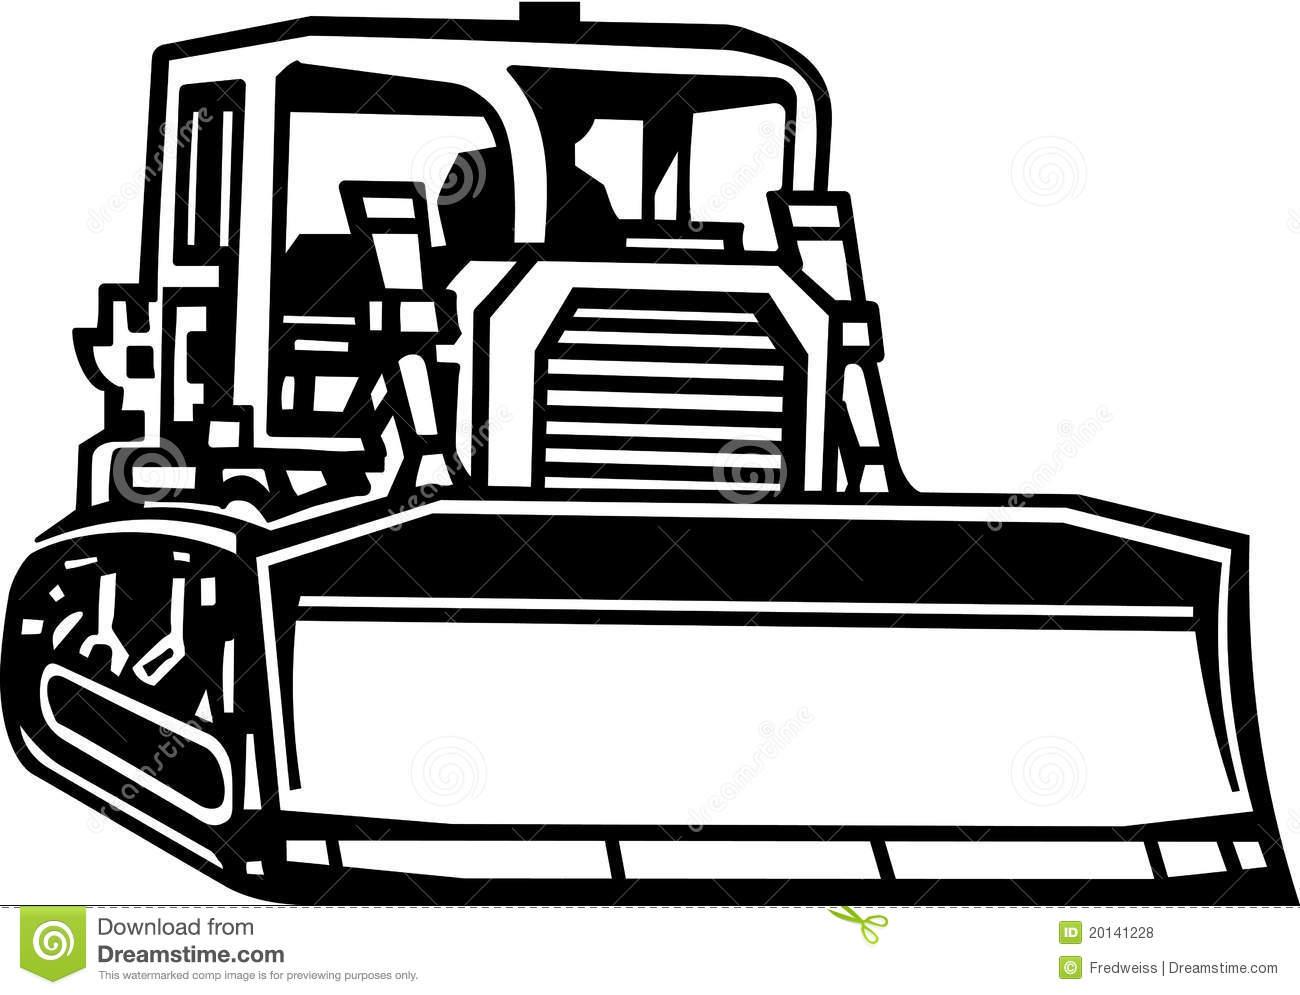 Bulldozer clipart black and white 4 » Clipart Station.